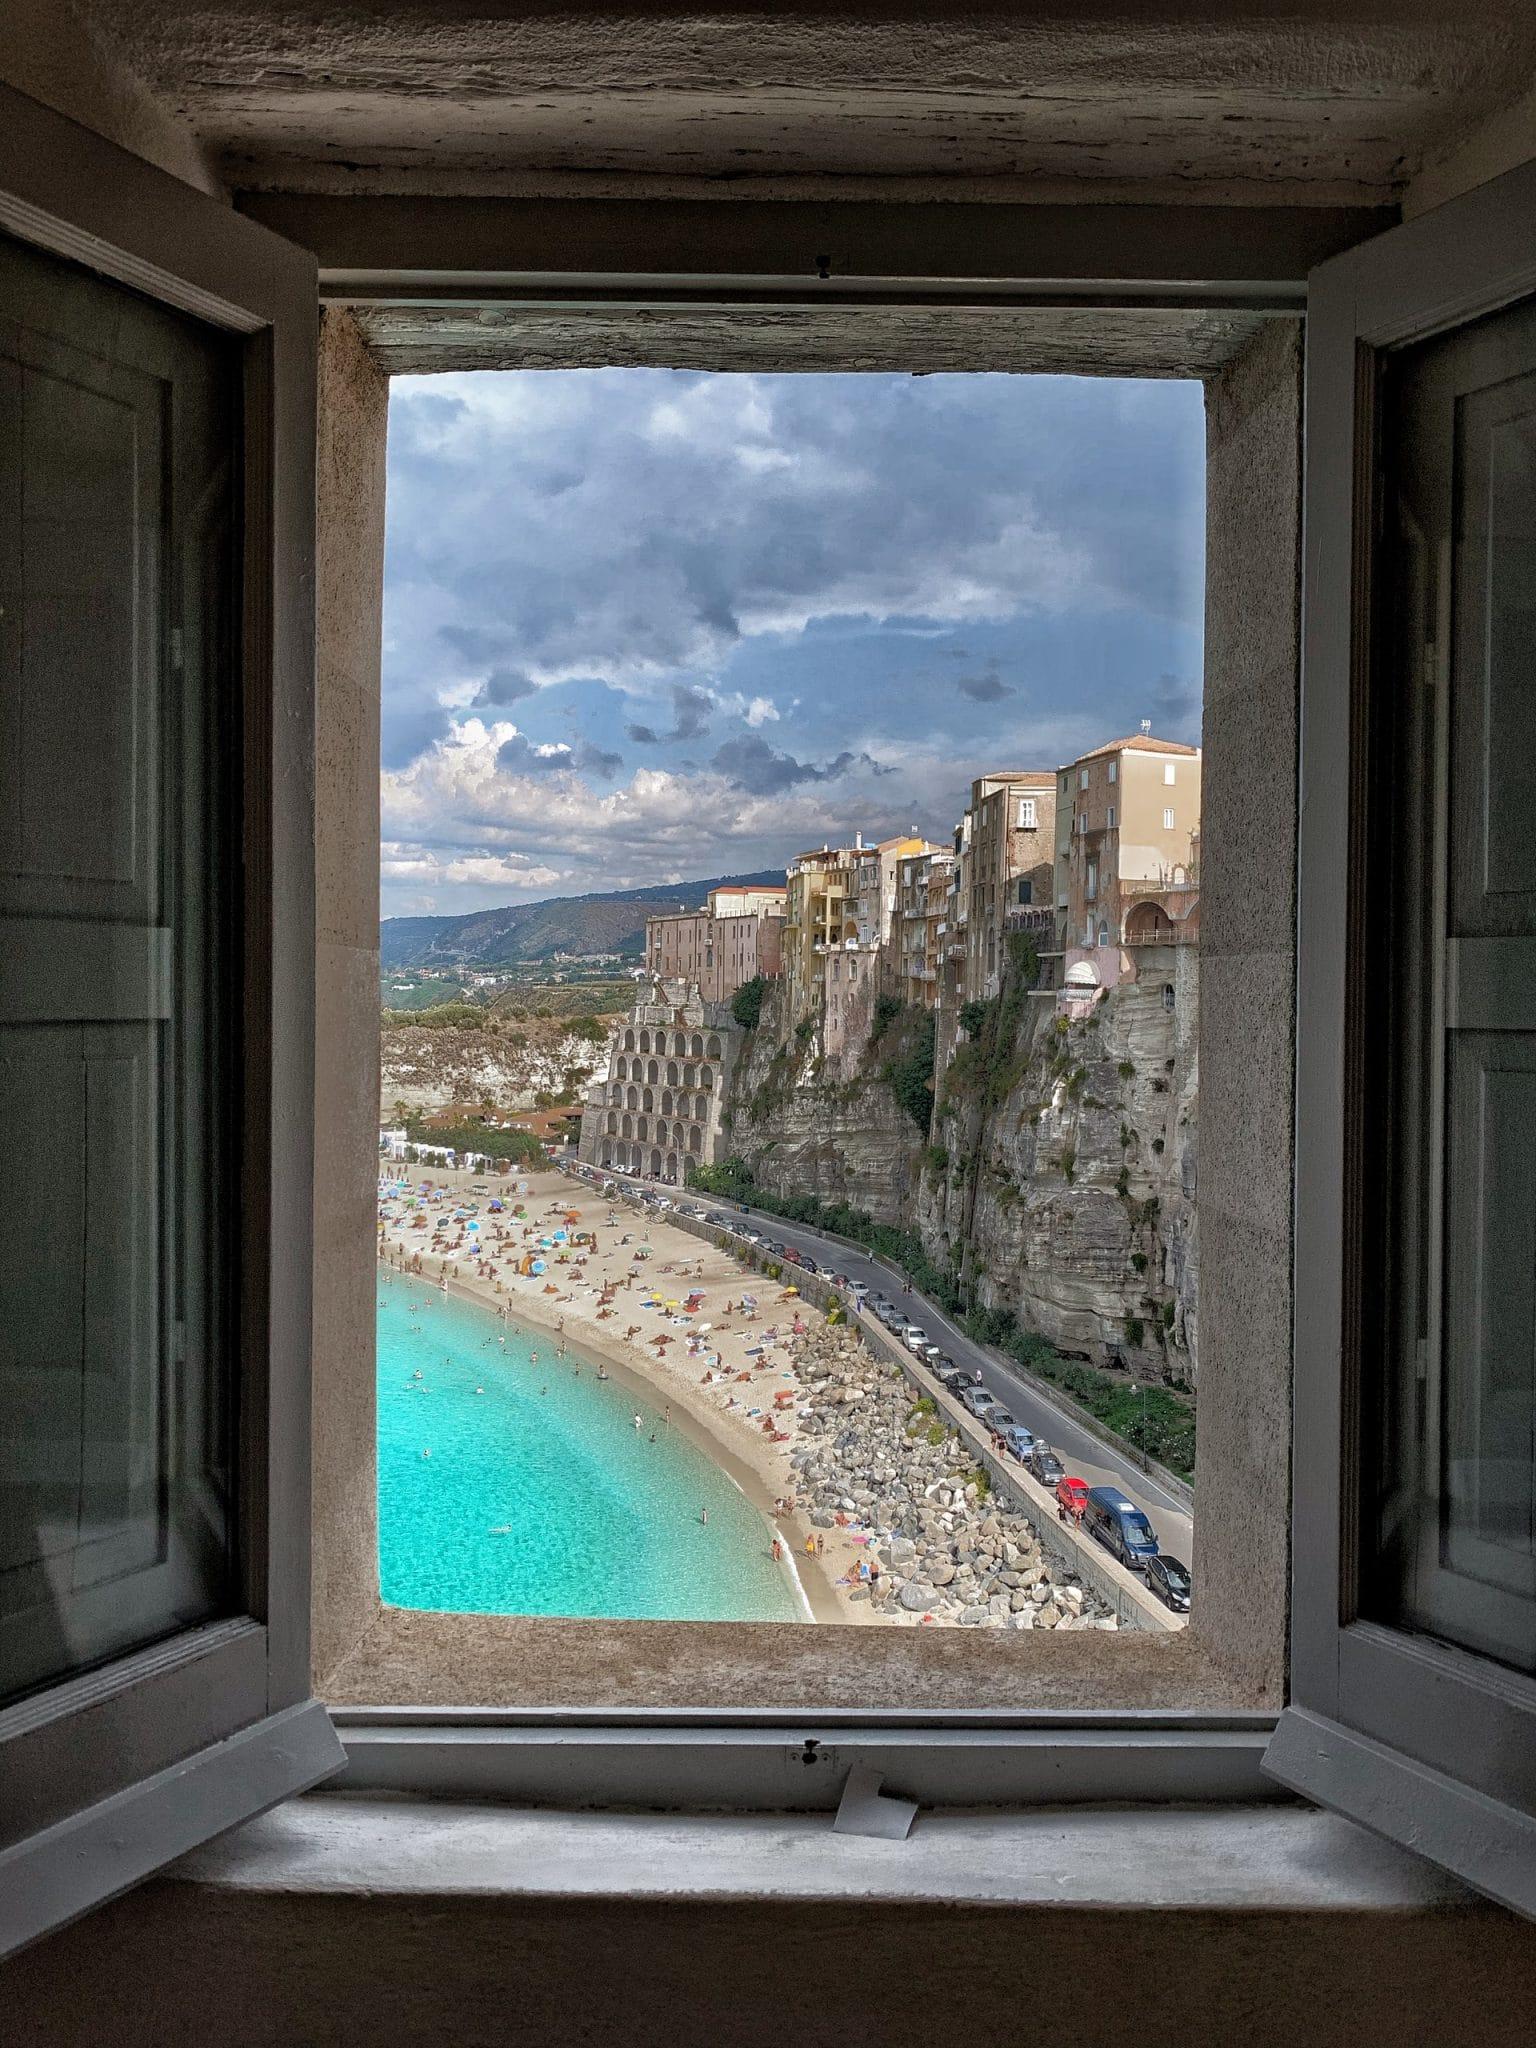 tropea beach plage italie